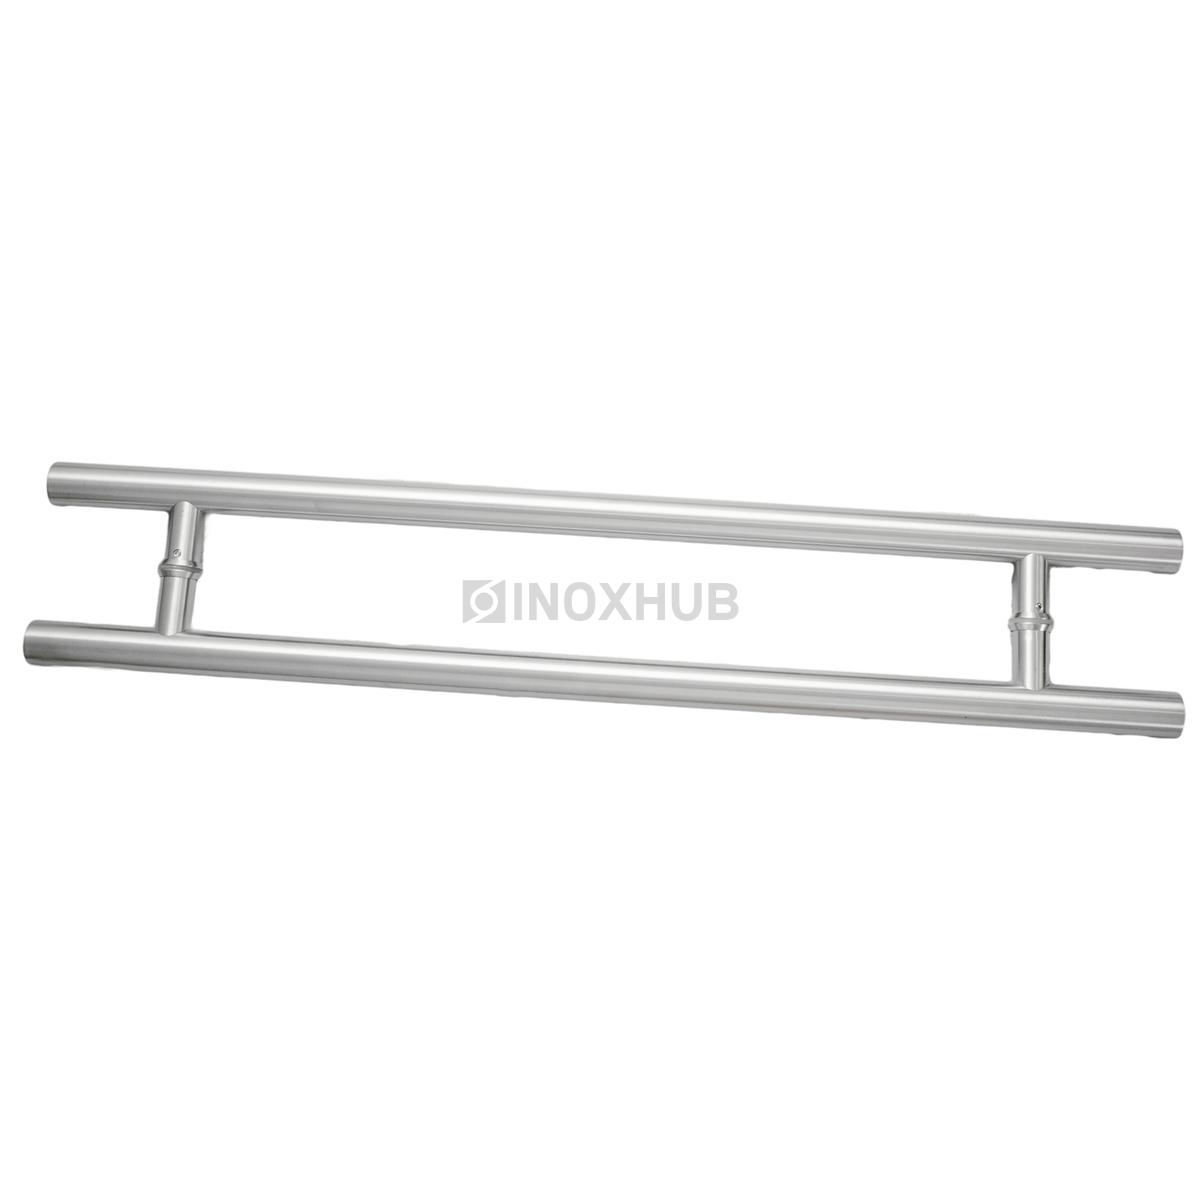 Ручка двусторонняя для стеклянных дверей, 633-800 SSS